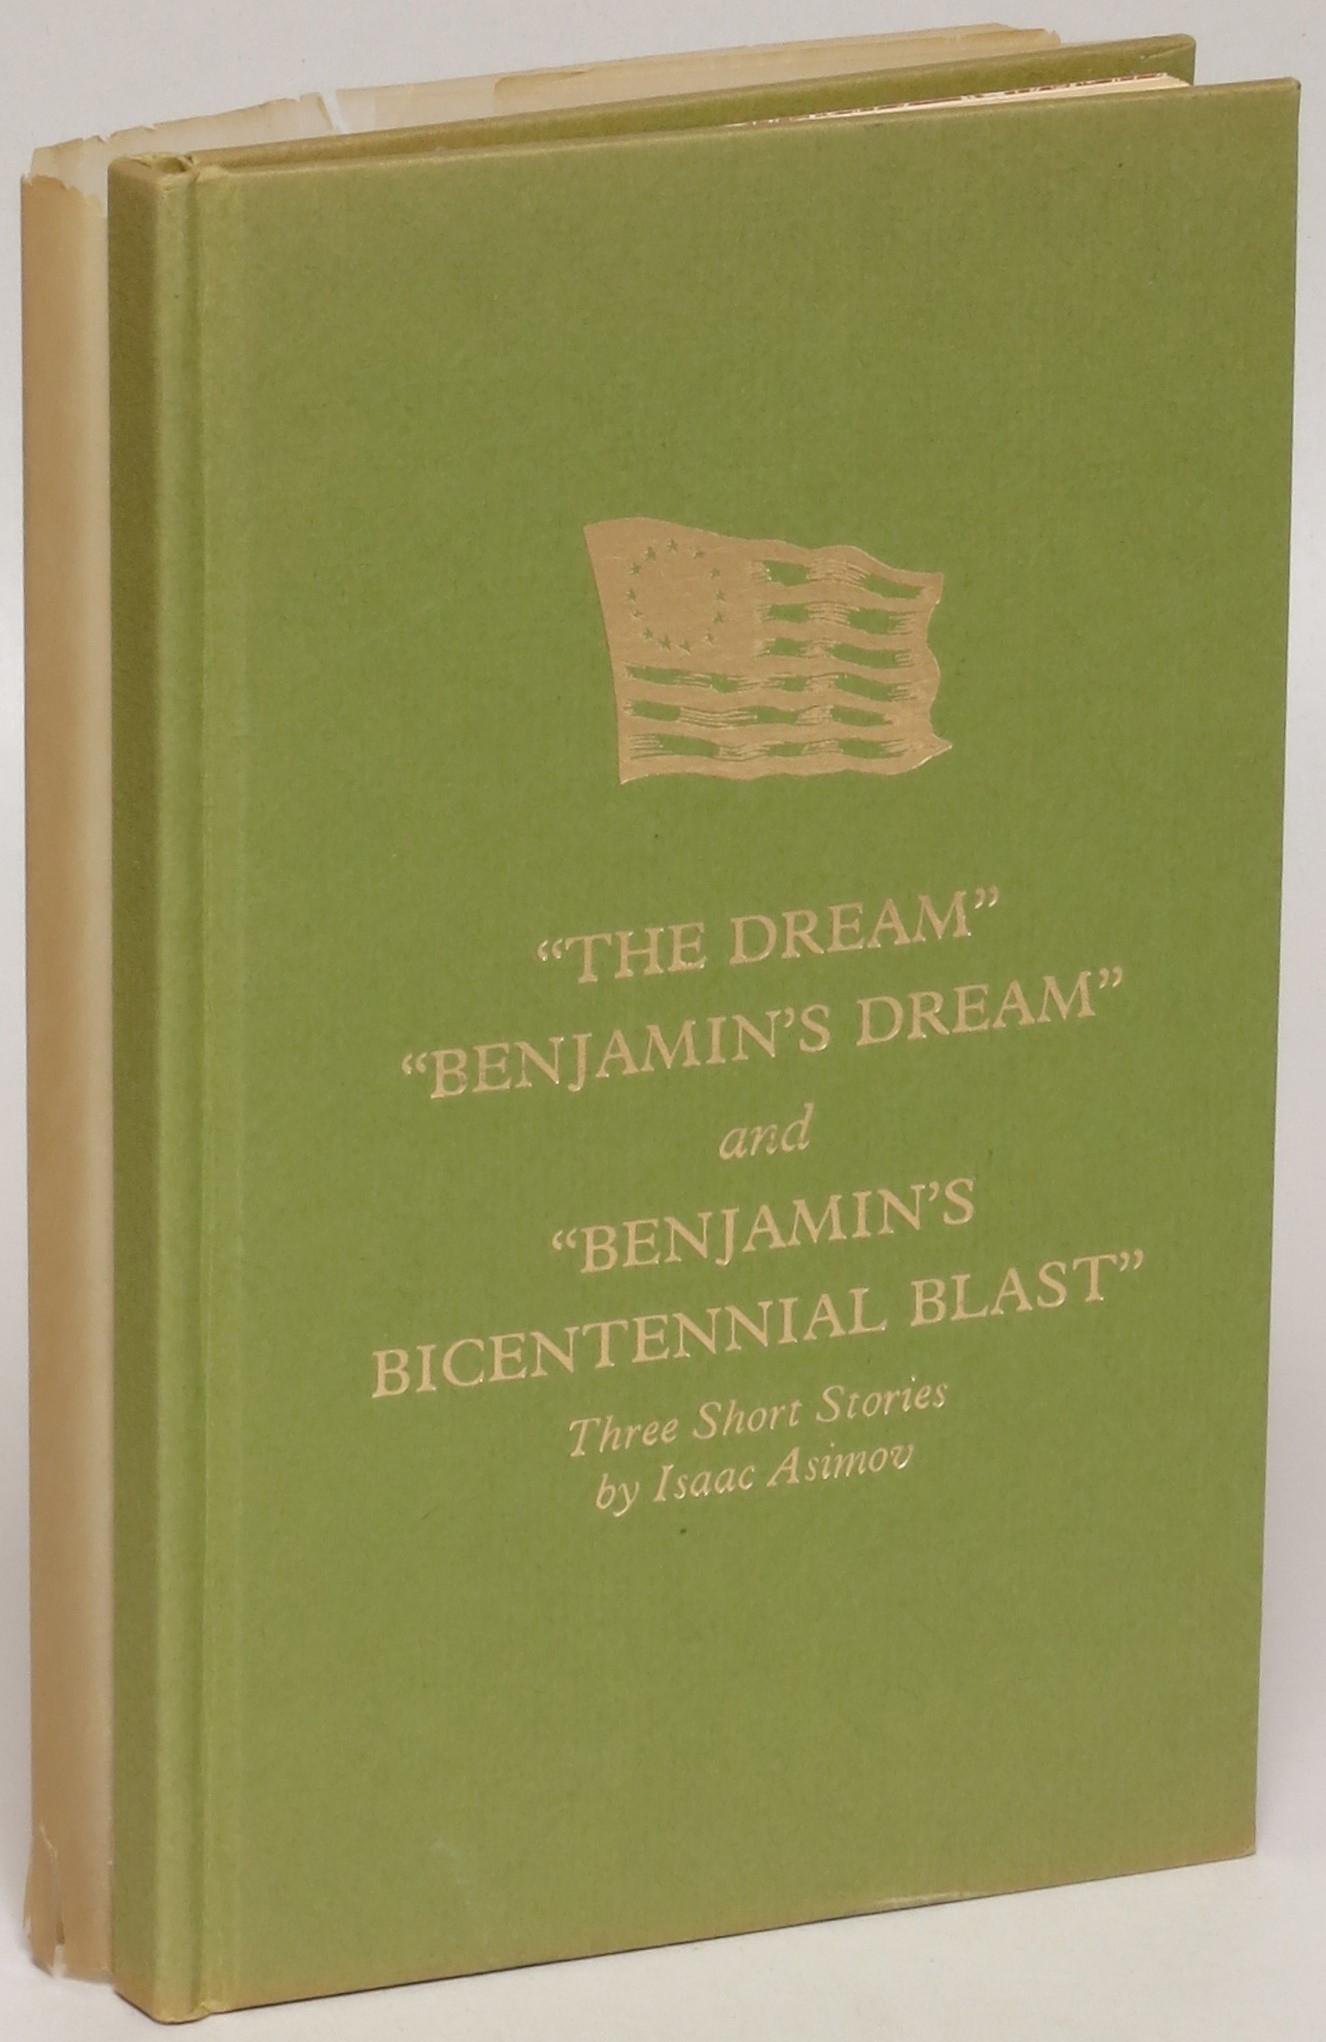 """The Dream"", ""Benjamin's Dream"" and ""Benjamin's Bicentennial Blast"""